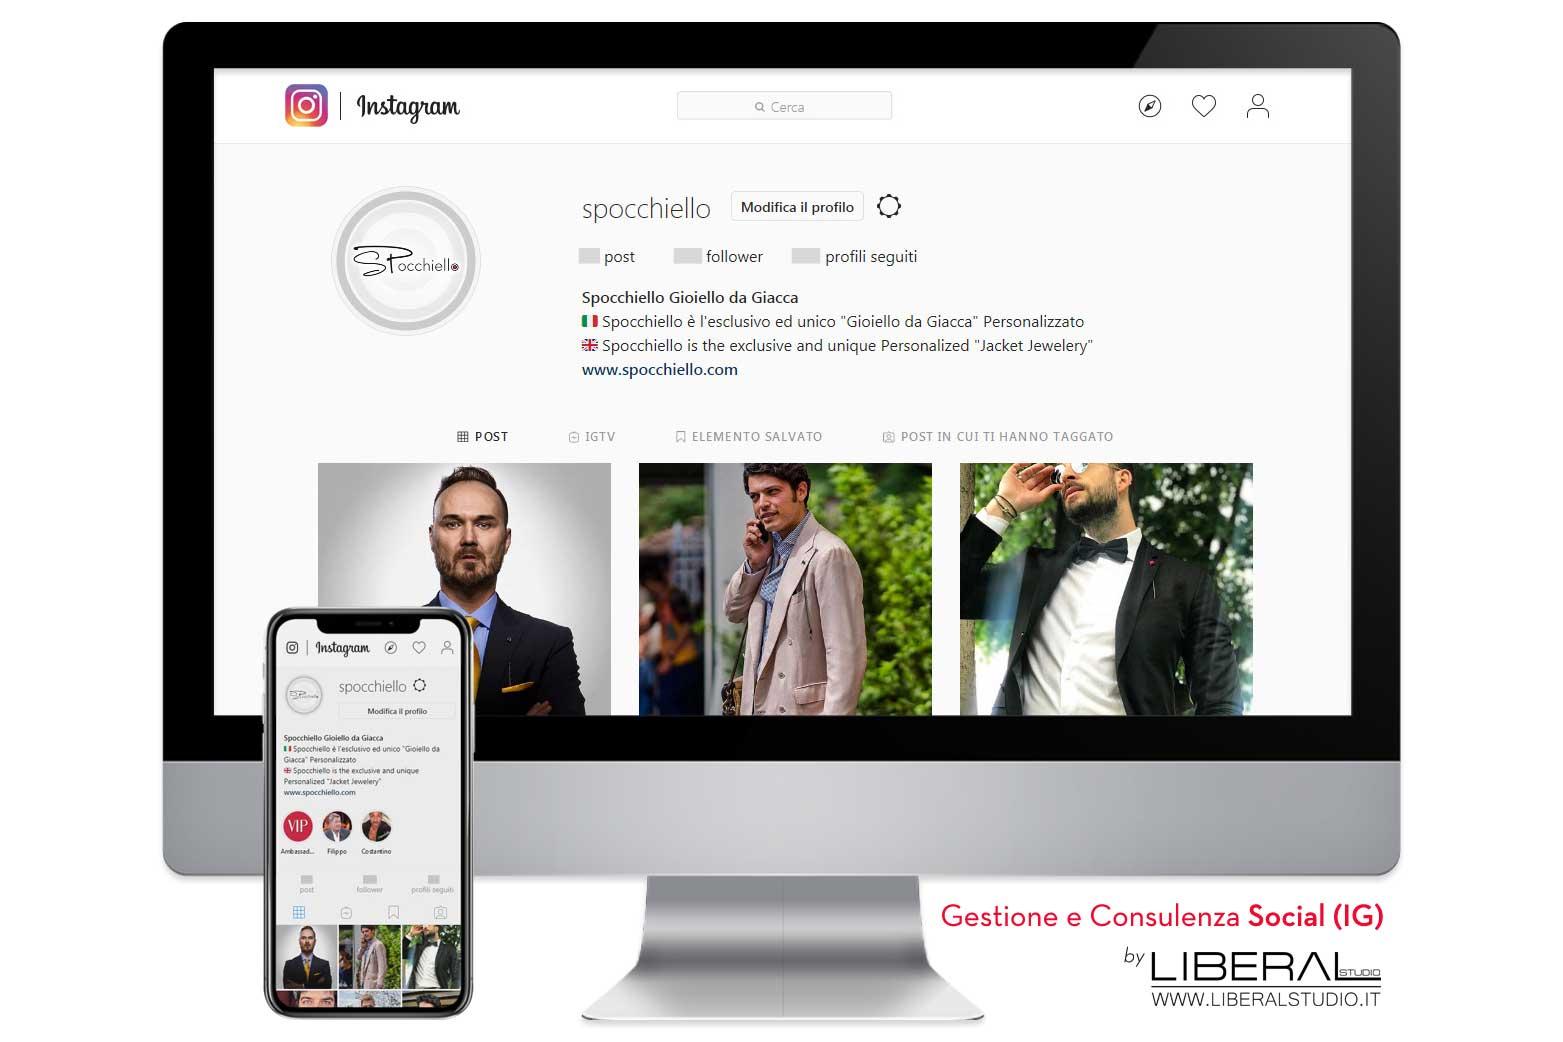 liberal studio gestione consulenza instagram